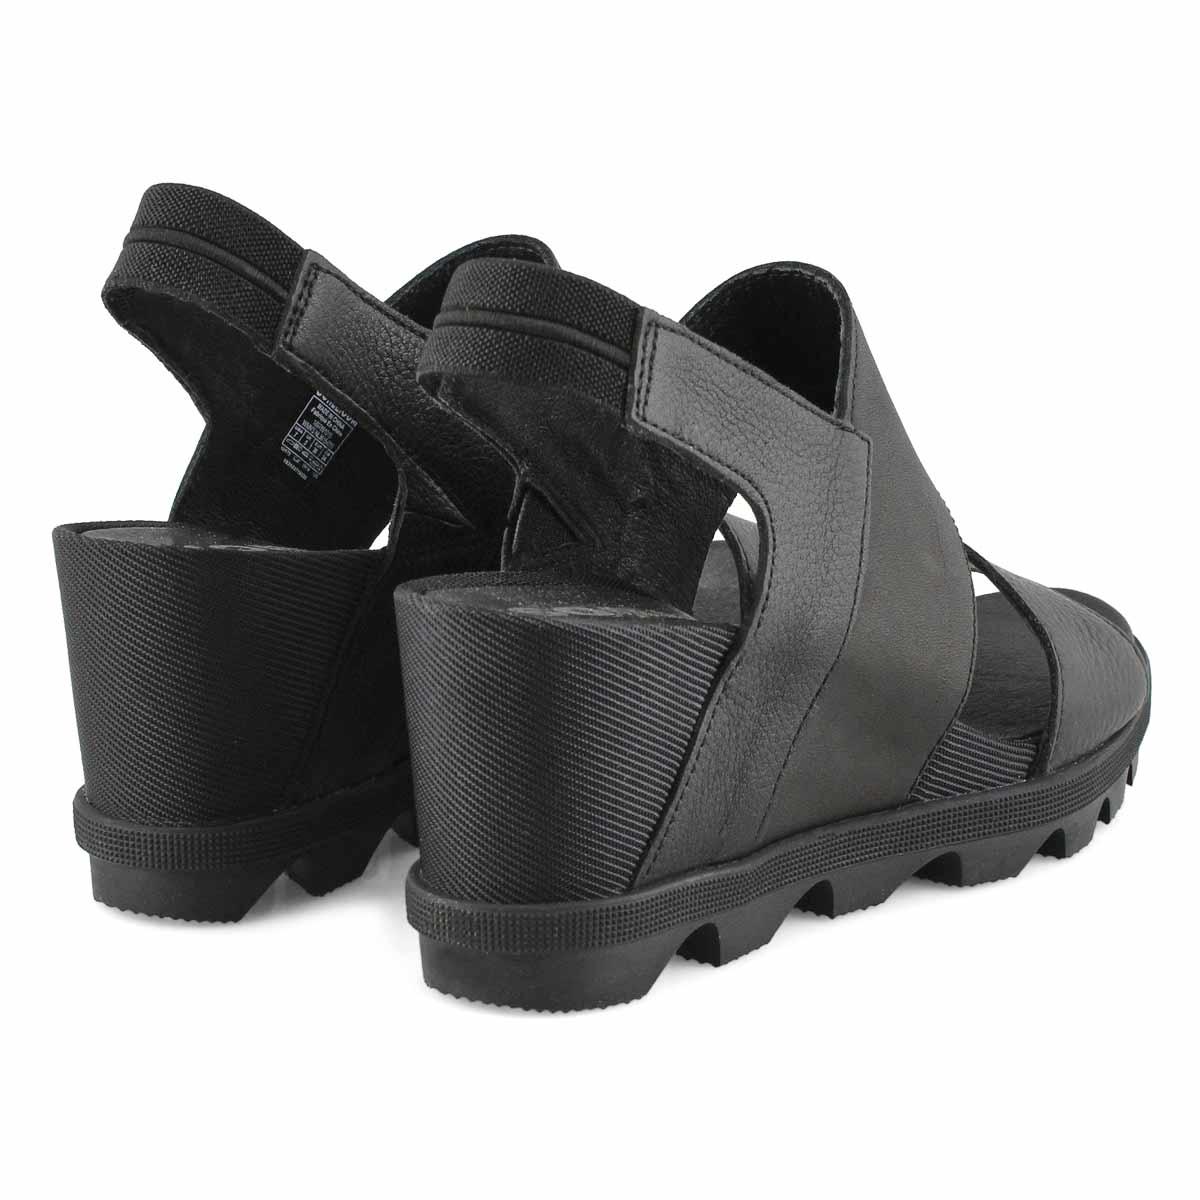 Women's Joanie II Slingback Sandal - Black